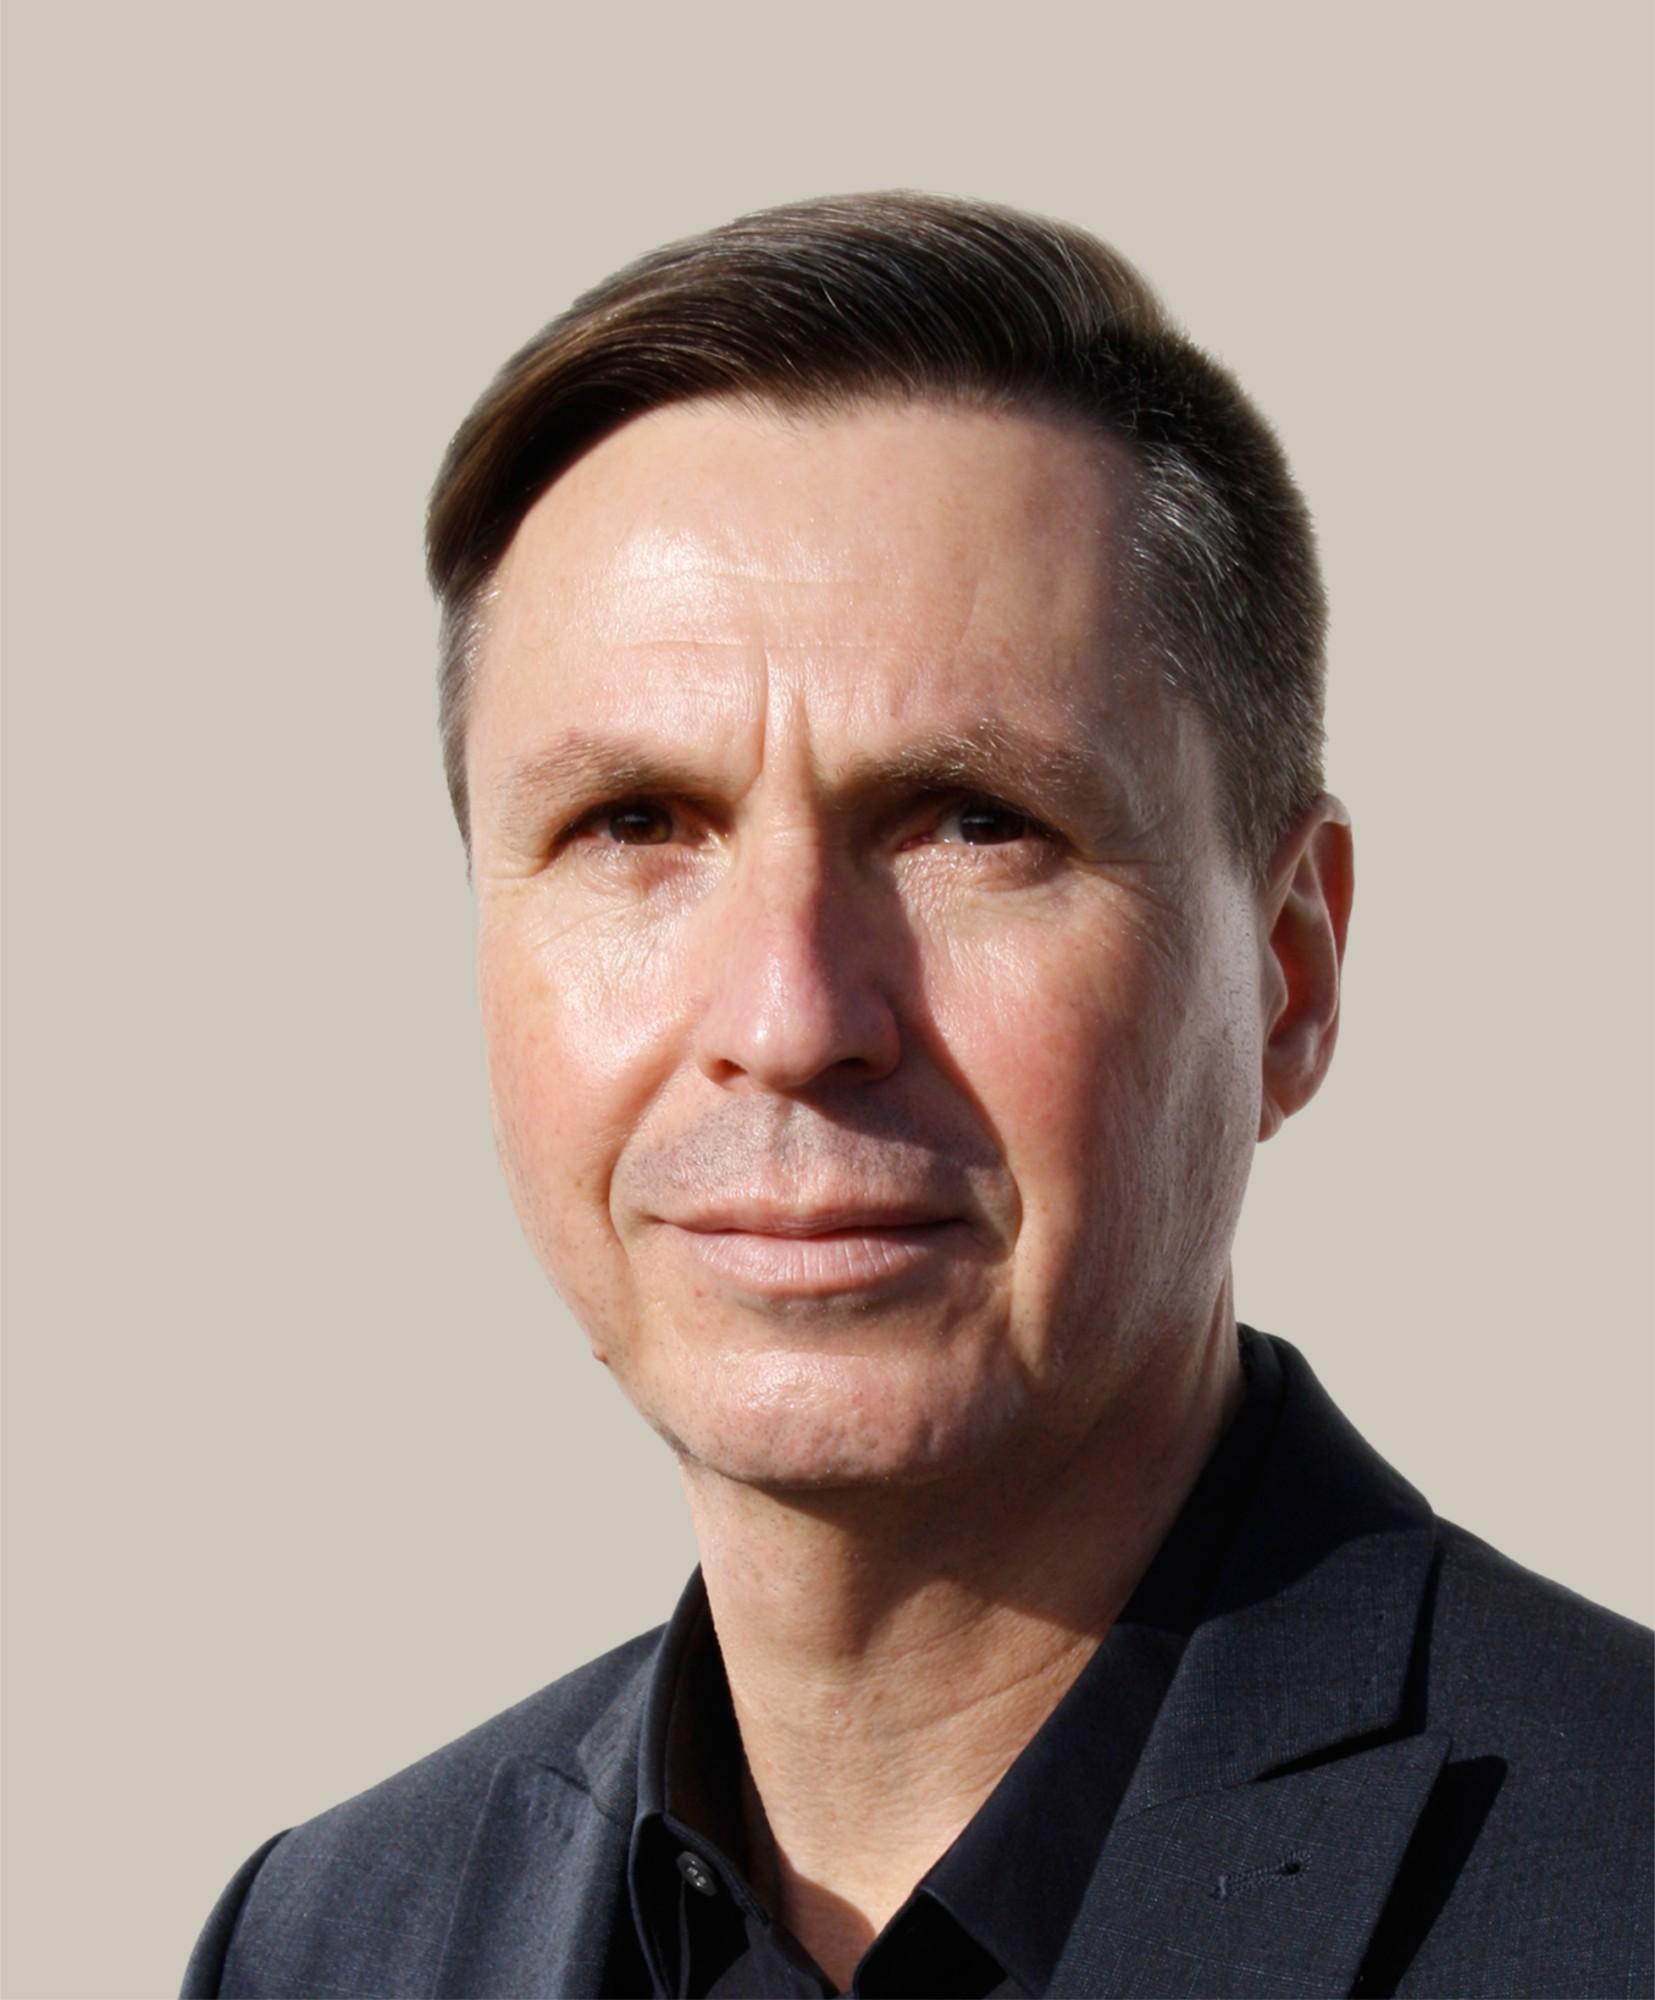 Prof. Dr. Johann Helmut Brandstätter